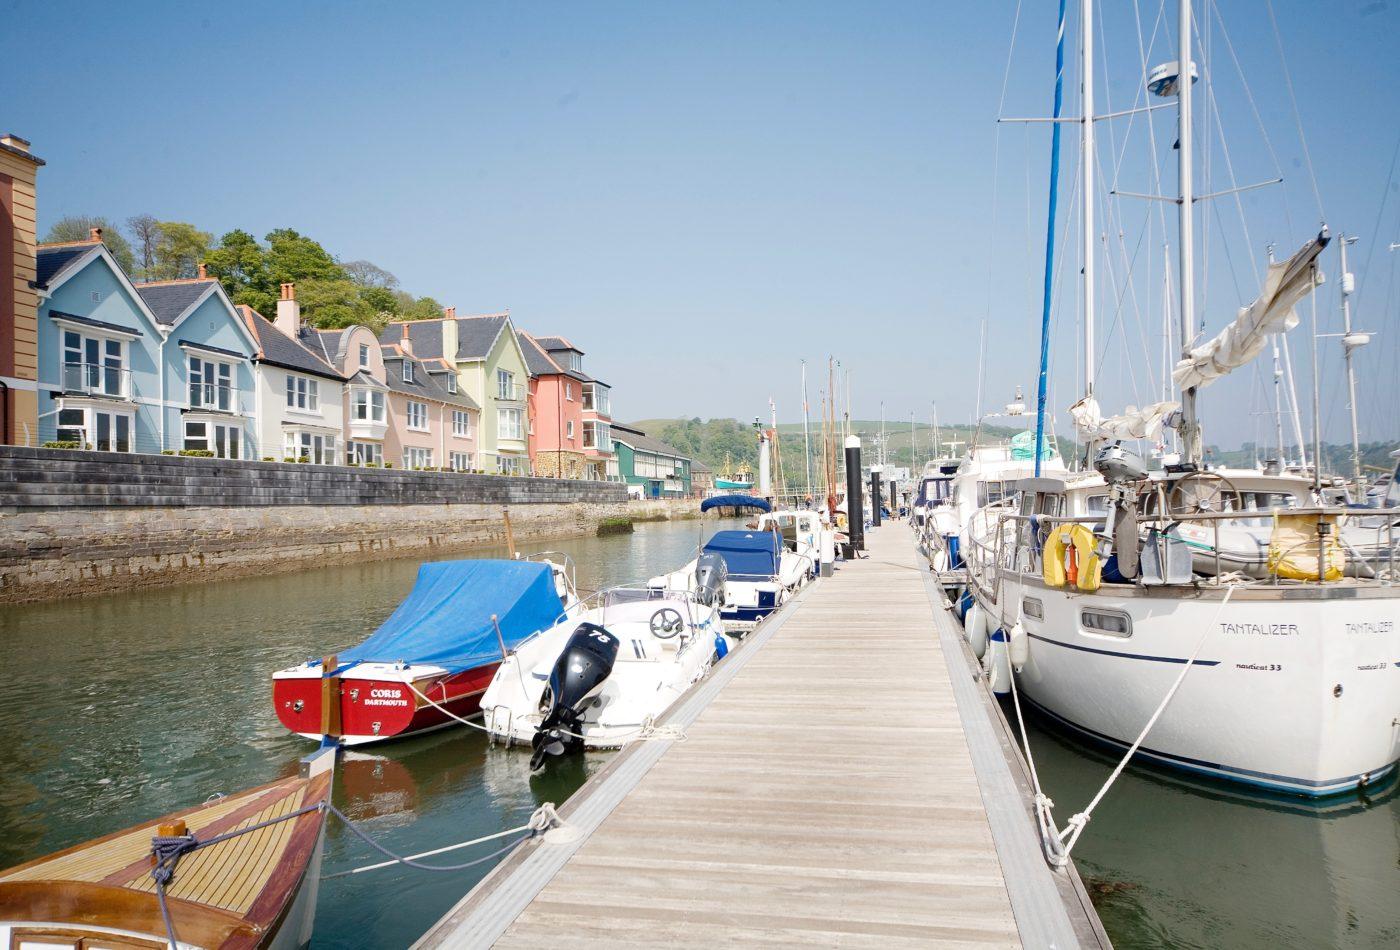 Where to buy a second home - Dart Marina